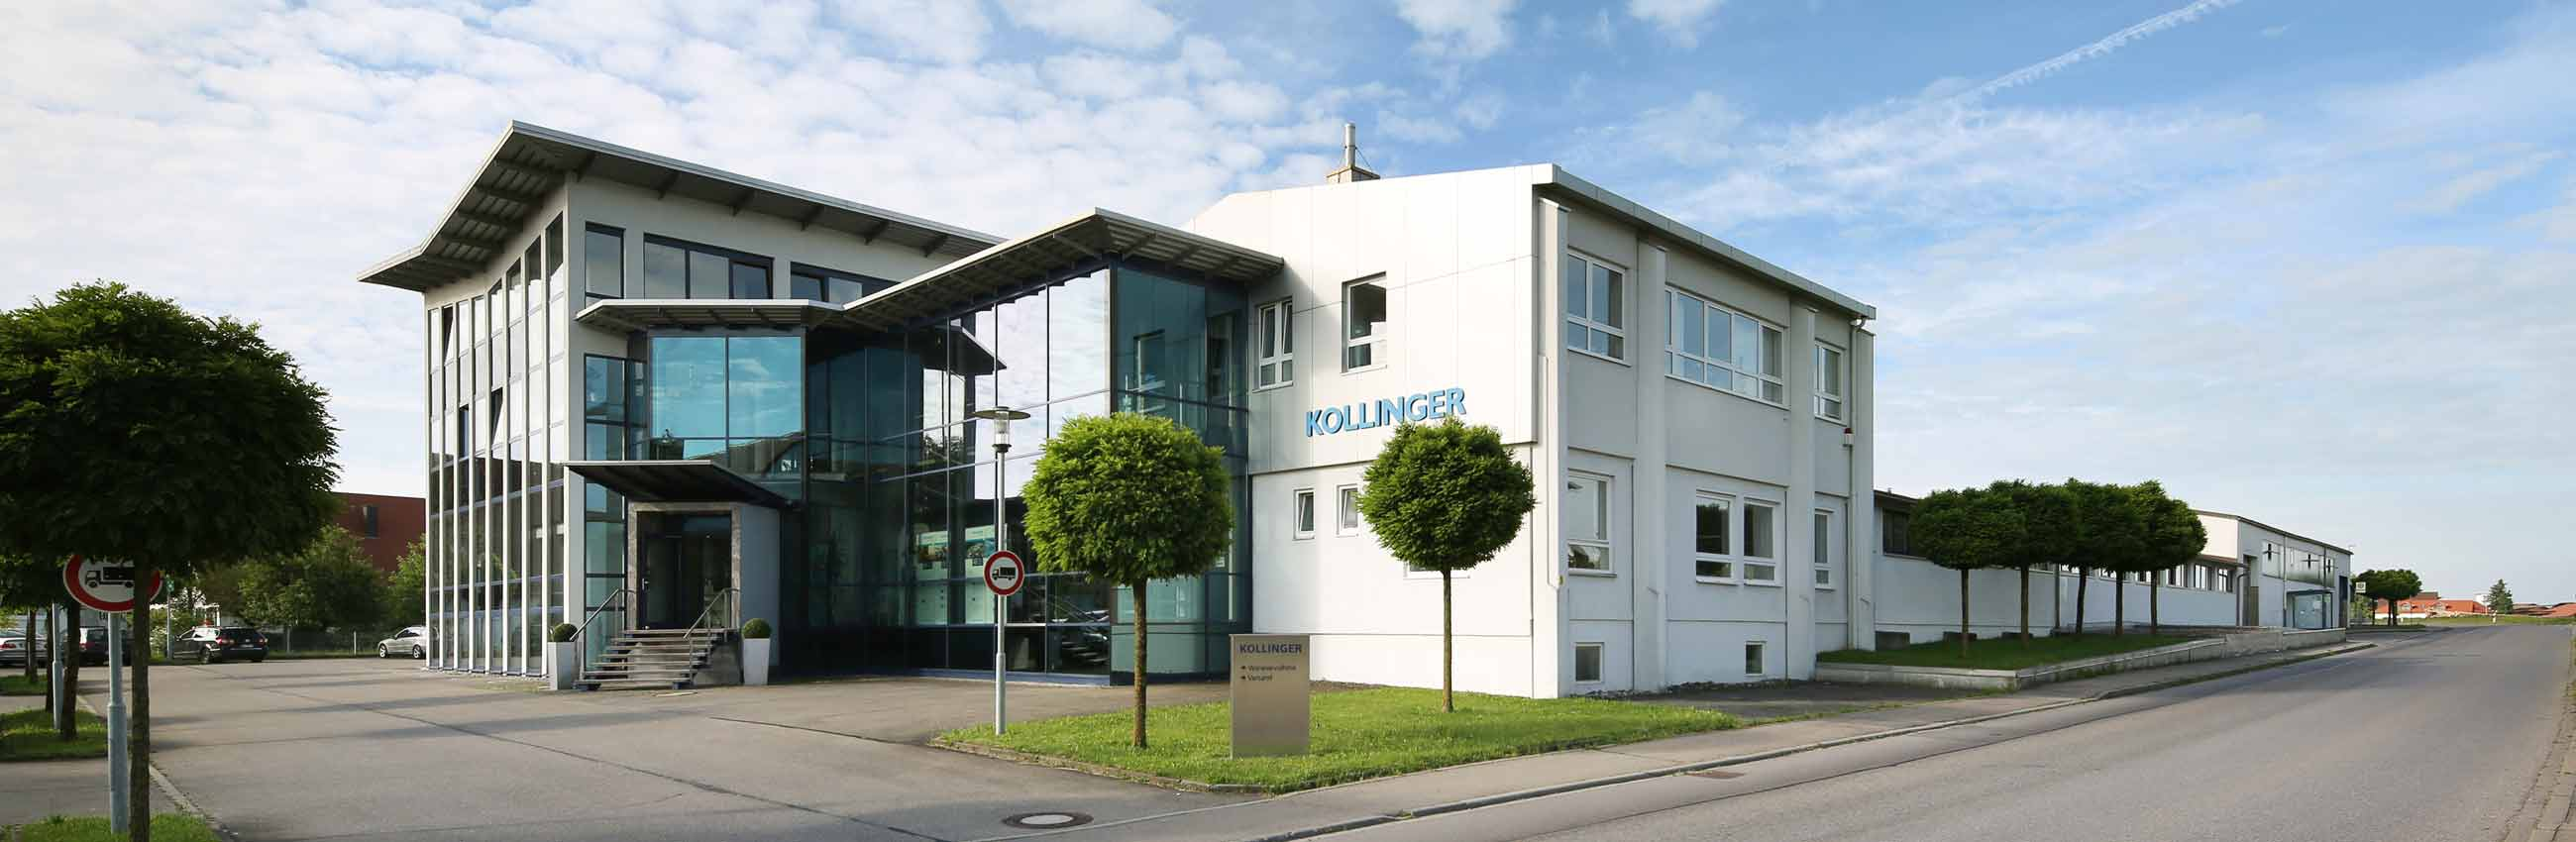 Kollinger Gebäude